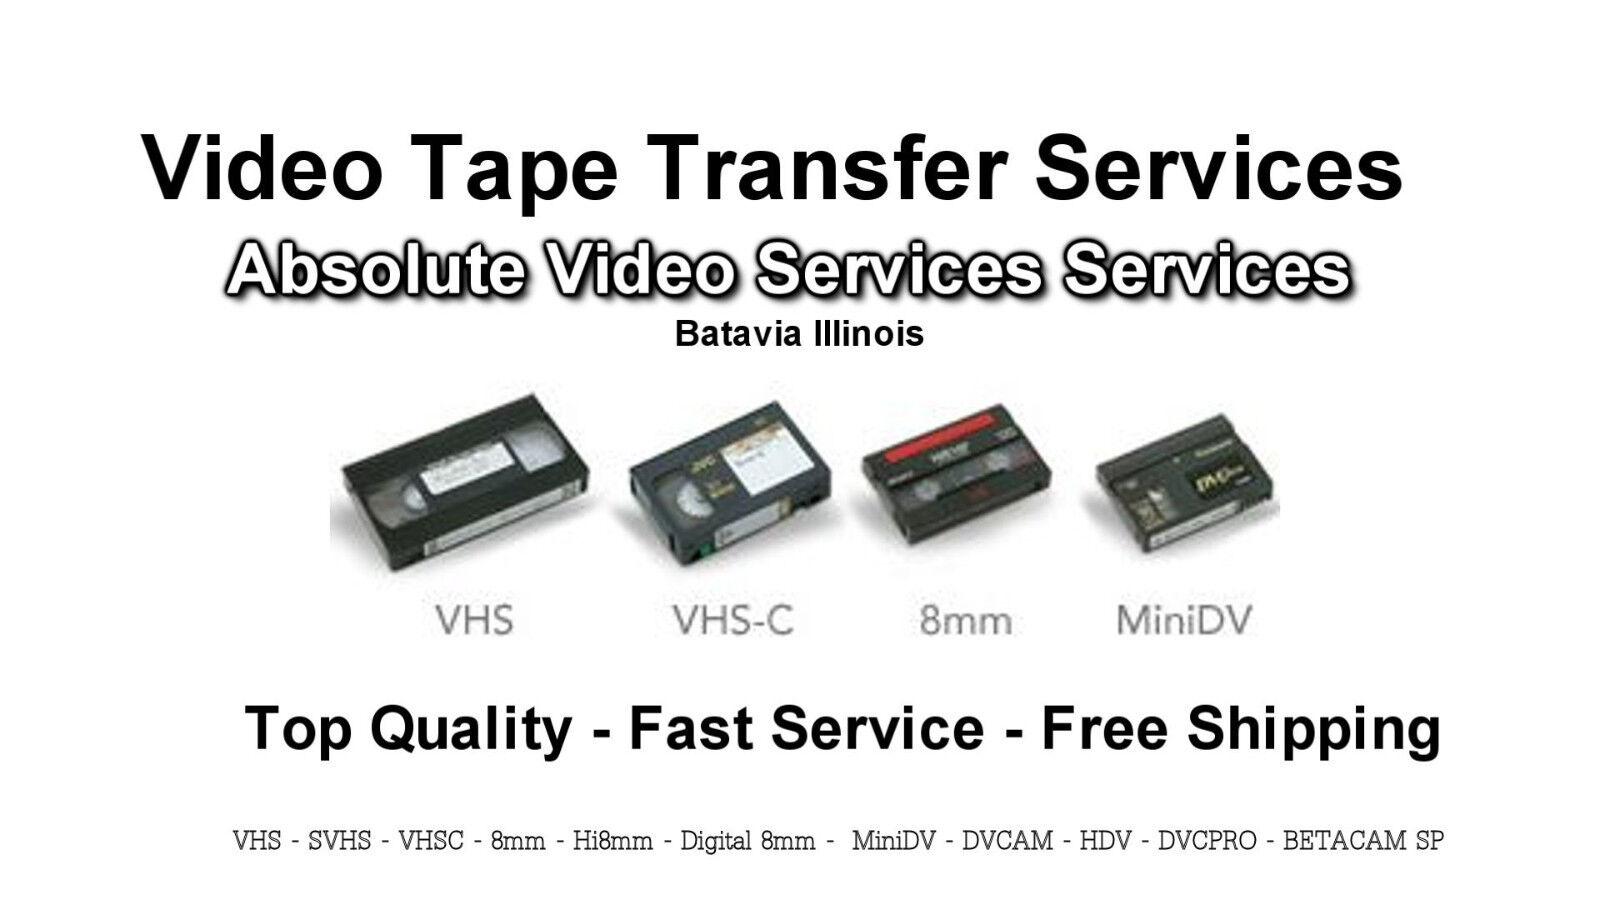 Video Tape Transfer Service to DVD VHS SVHS VHSC Video Tape Convert